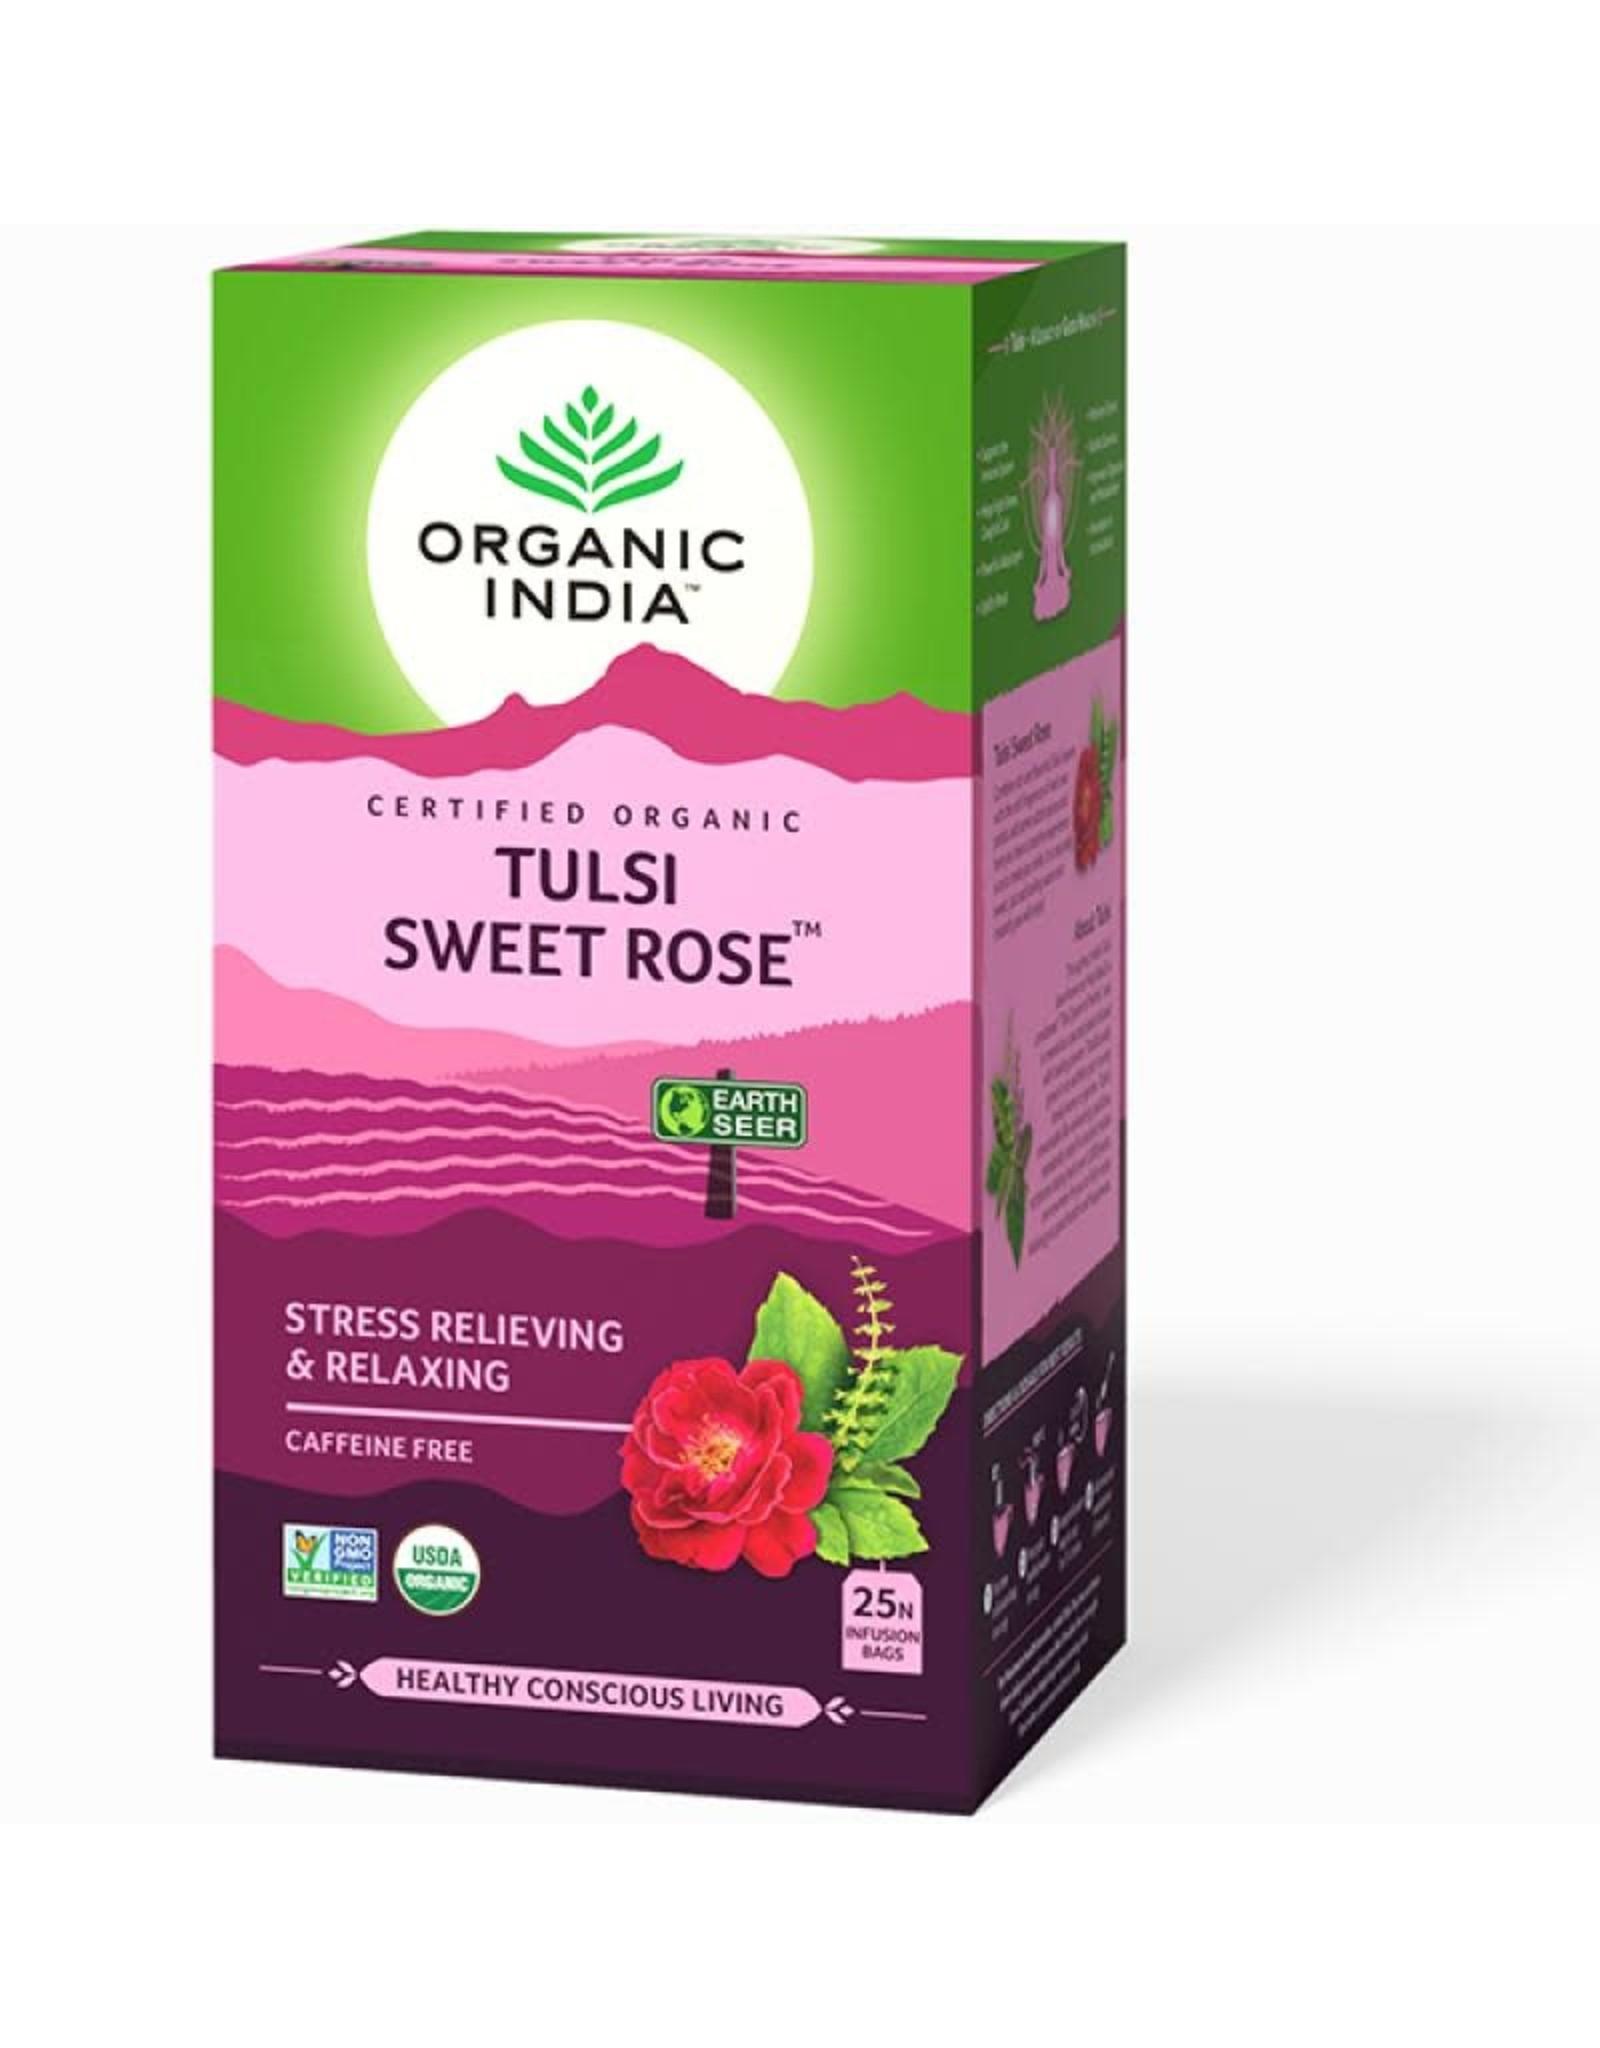 Organic India Tulsi Sweet Rose